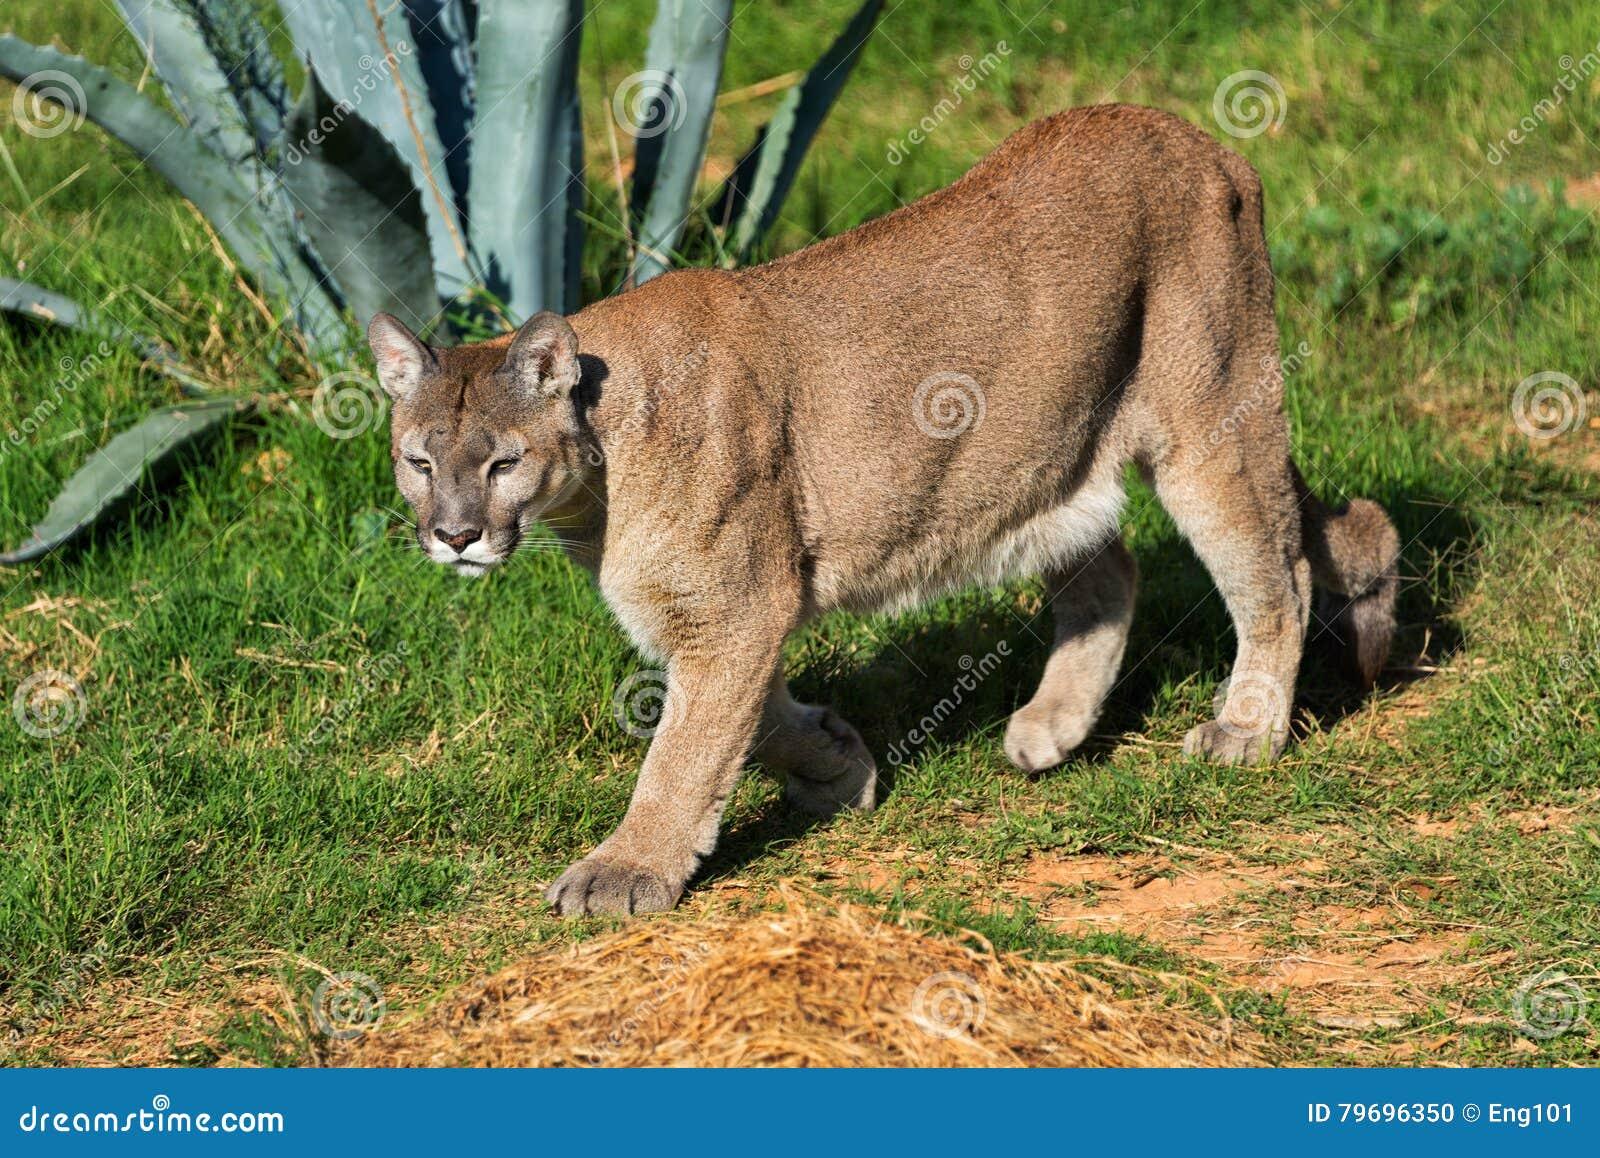 ca0dbd069e3bb Cougar walking stock photo. Image of puma